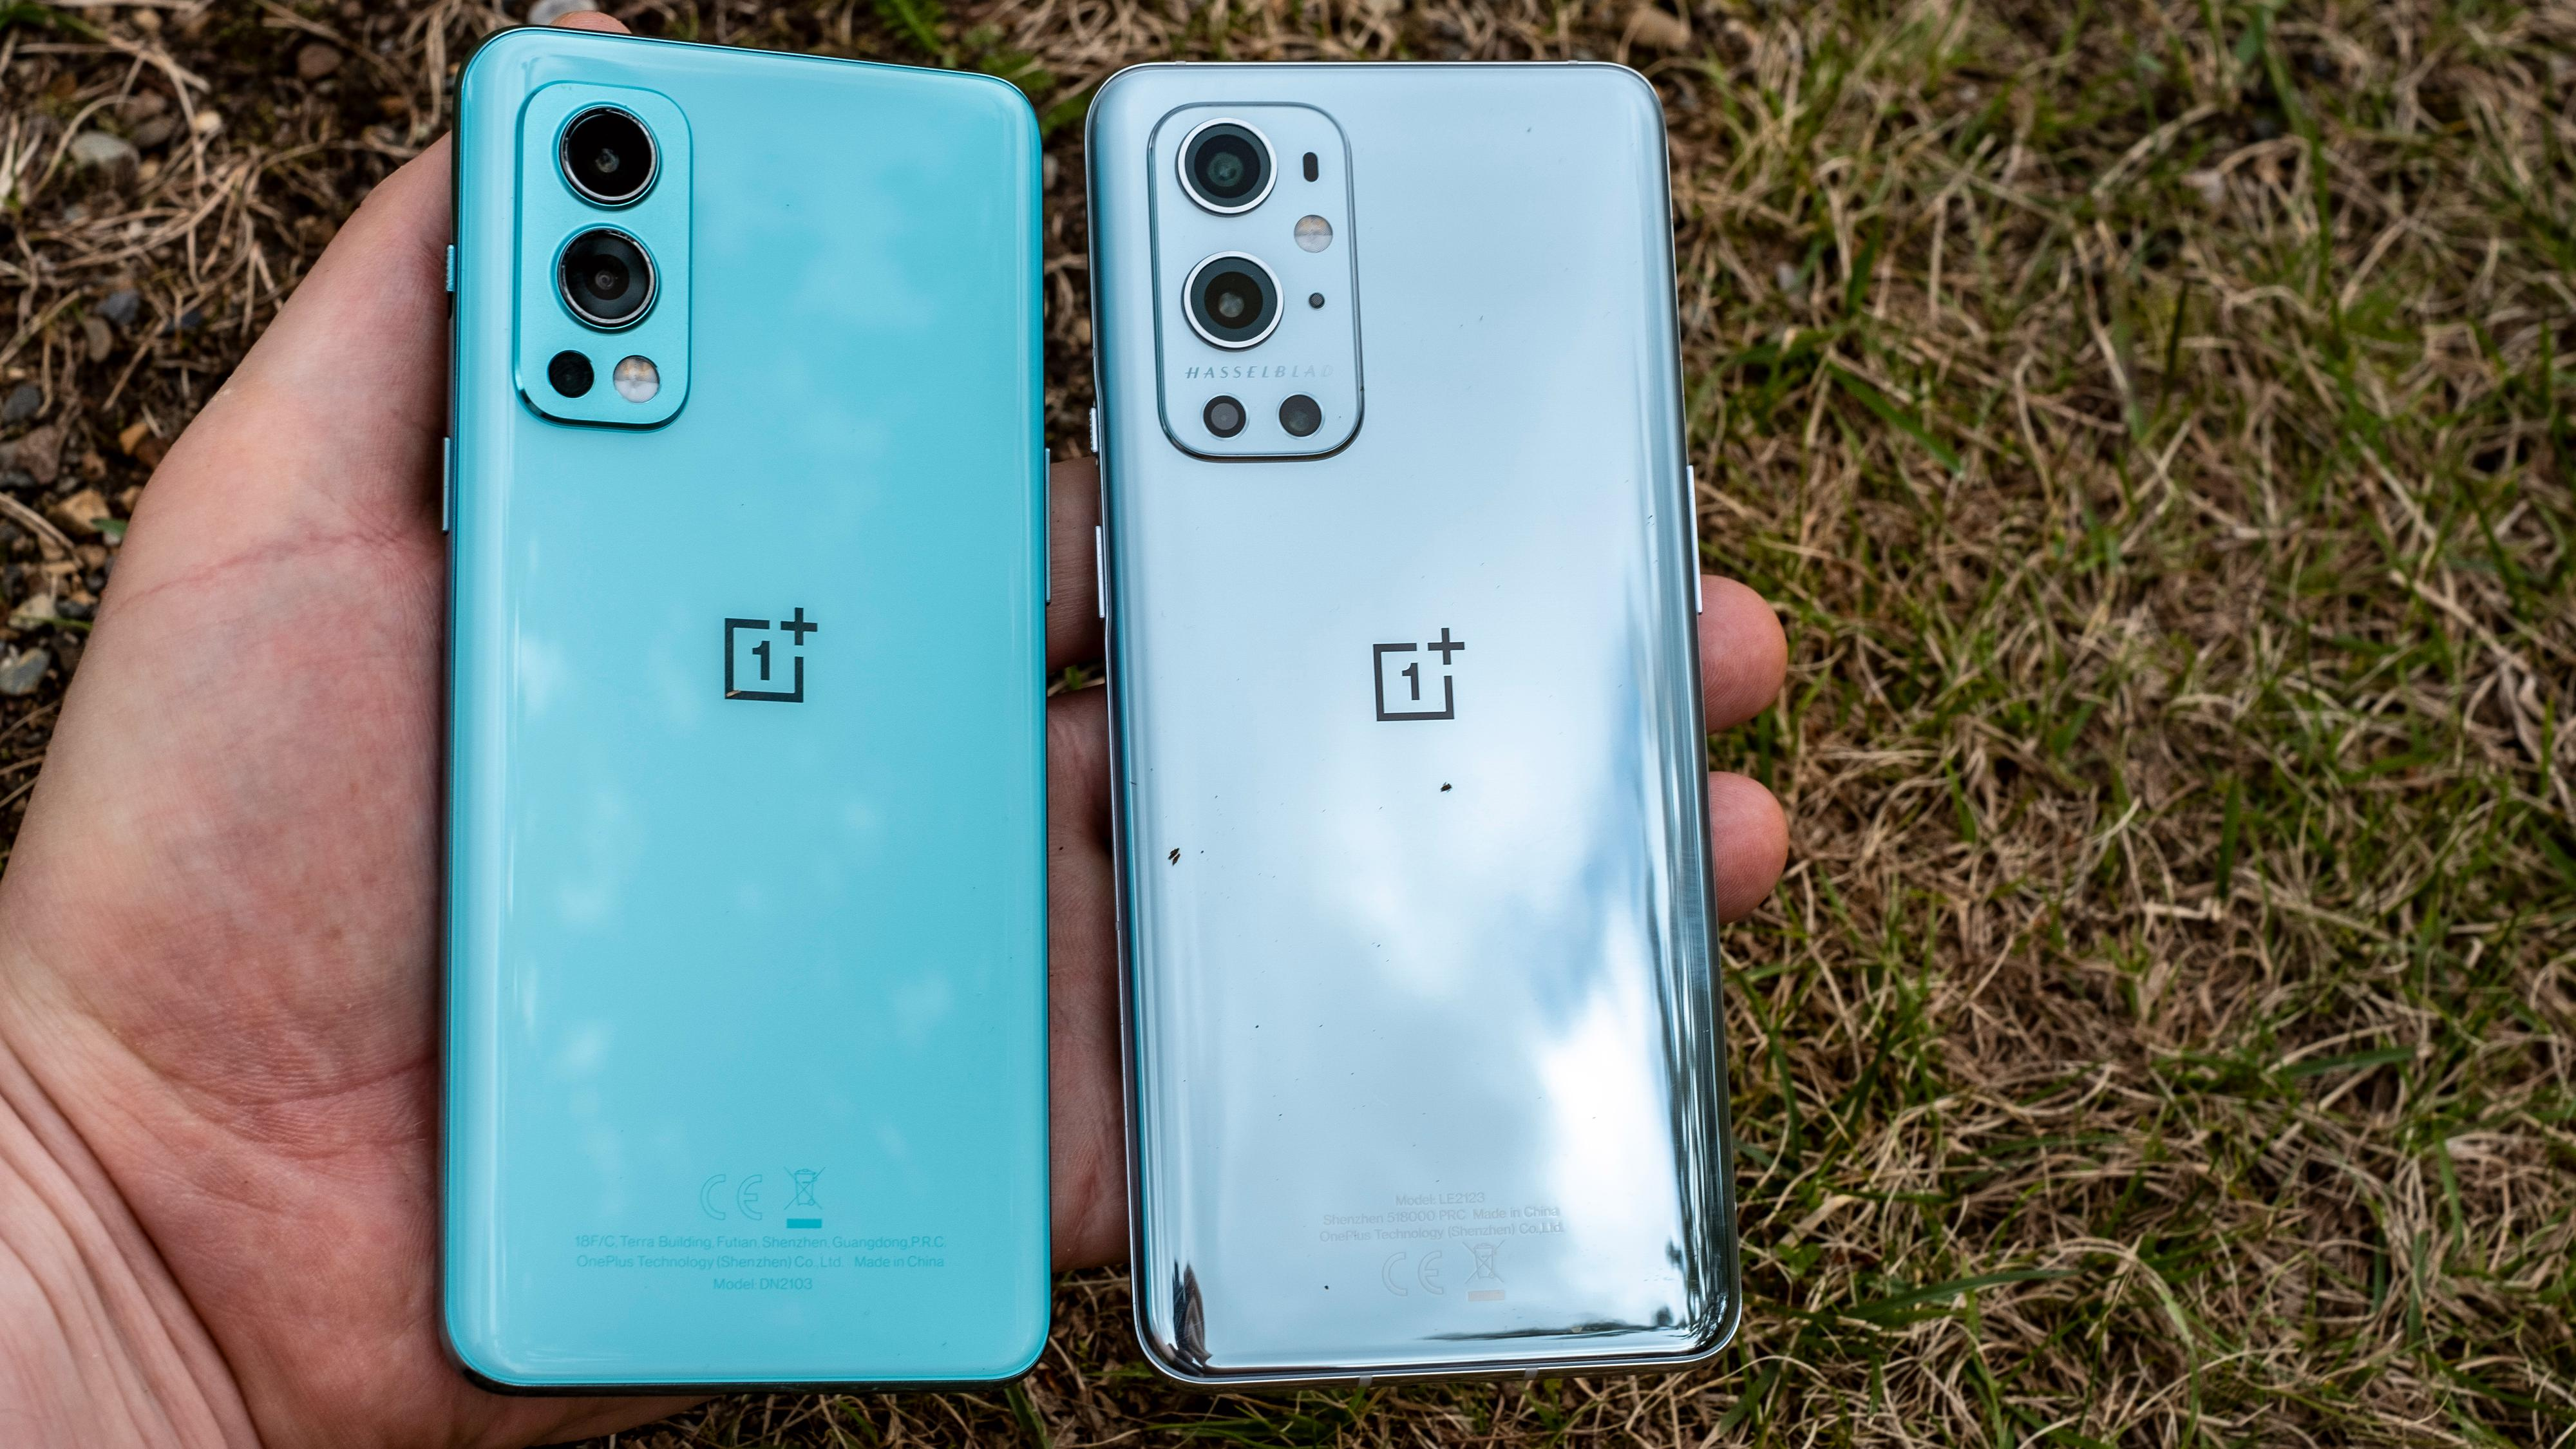 OnePlus Nord 2 og dobbelt så dyre OnePlus 9 Pro side om side. Nord 2 til venstre.